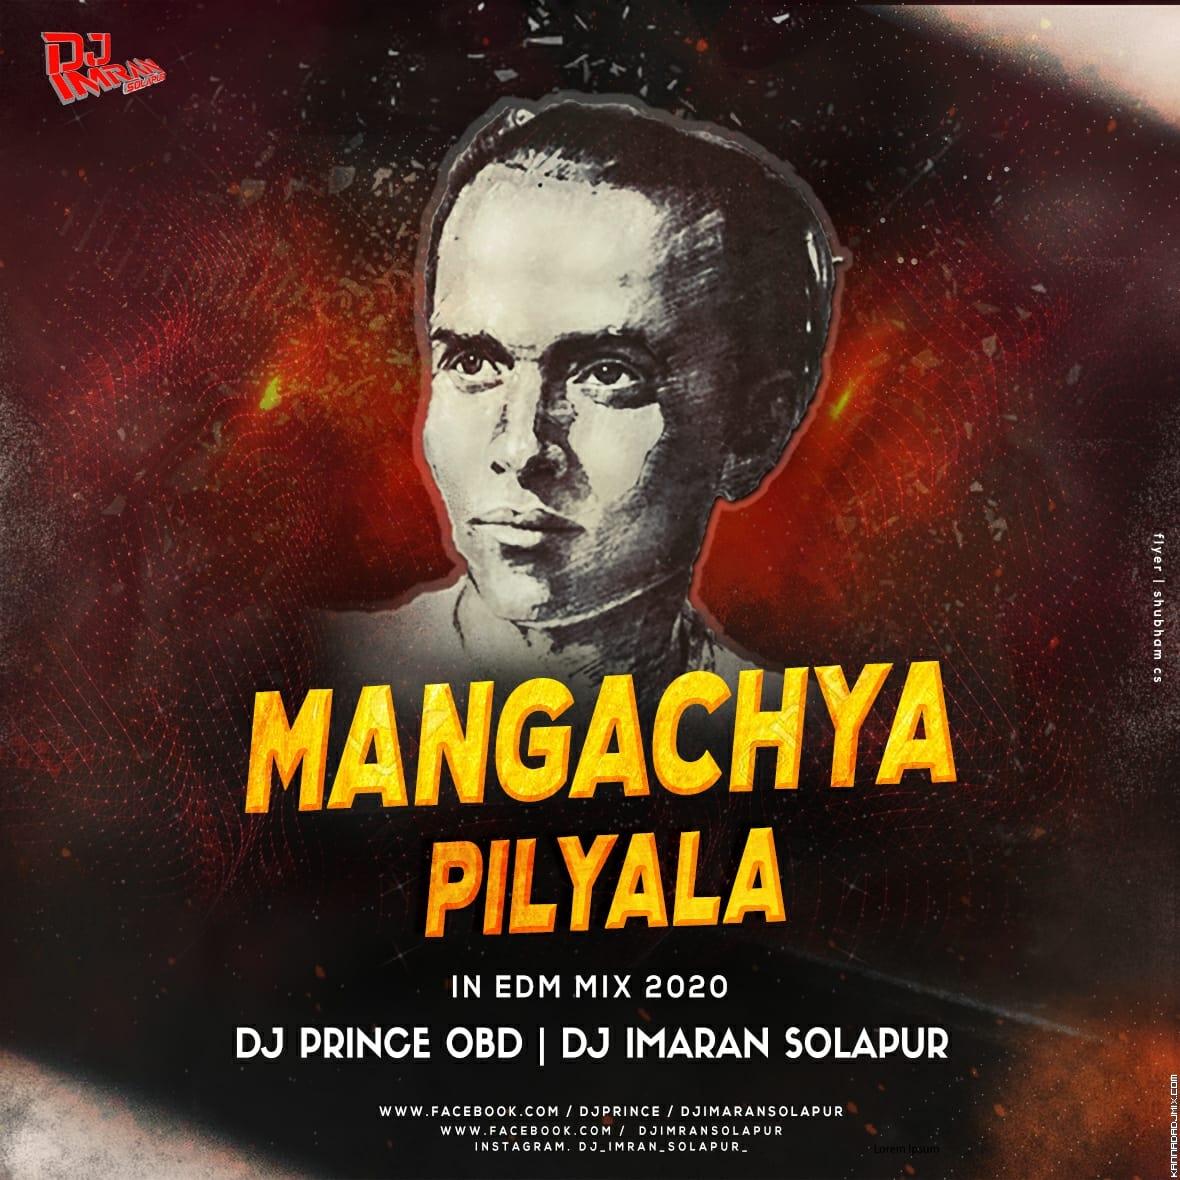 Mangachya Pilyala - In Edm Mix 2020 - Dj Prince OBD   Dj Imran Solapur.mp3